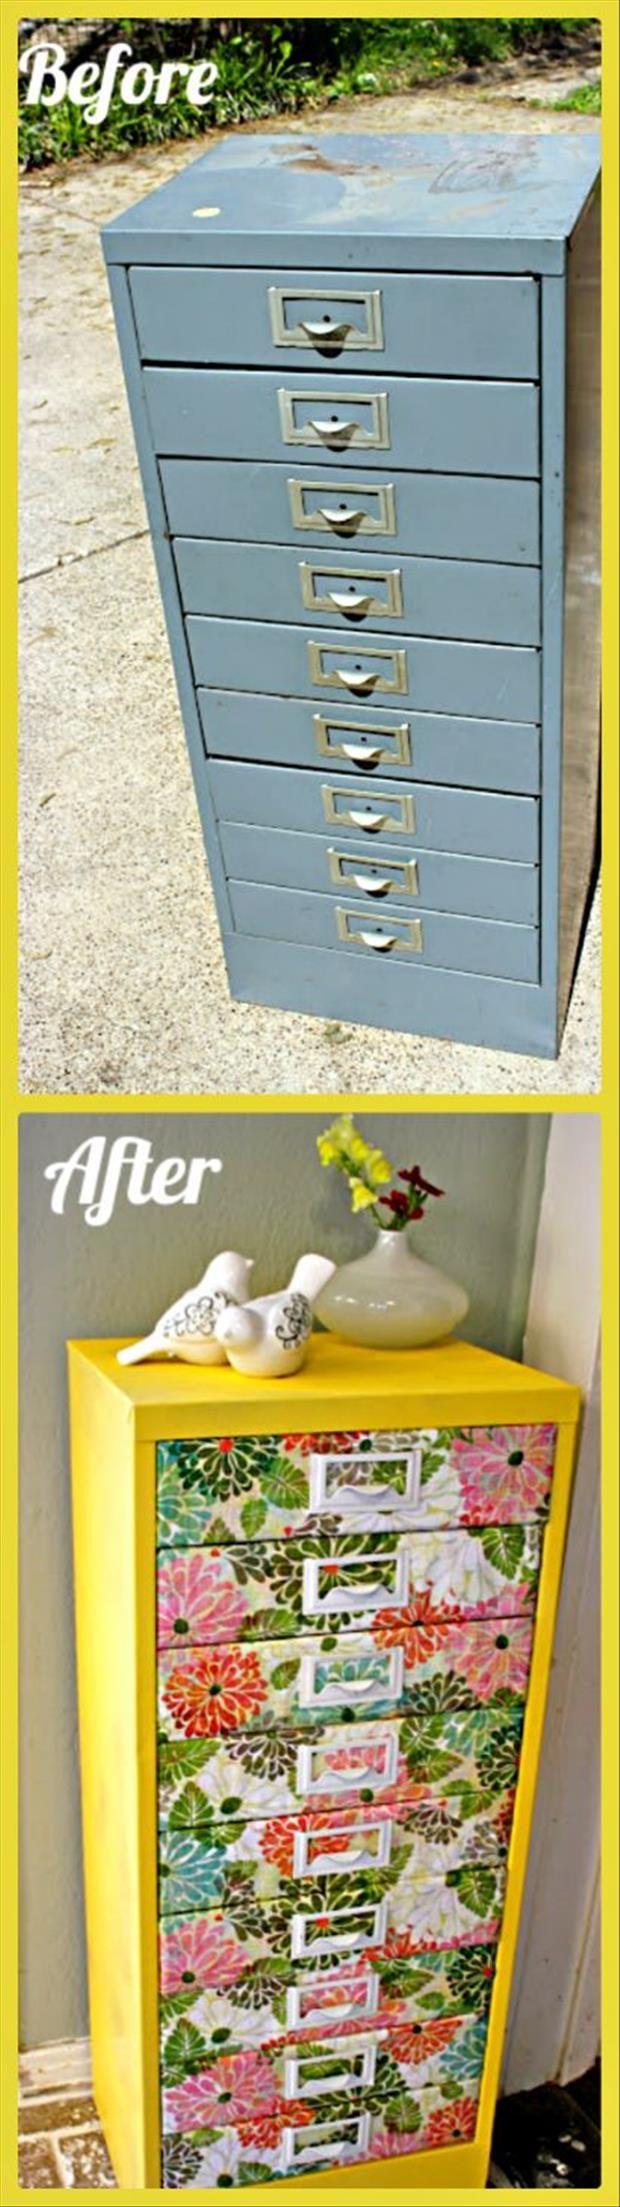 Dump A Day Fun Do It Yourself Craft Ideas - 31 Pics